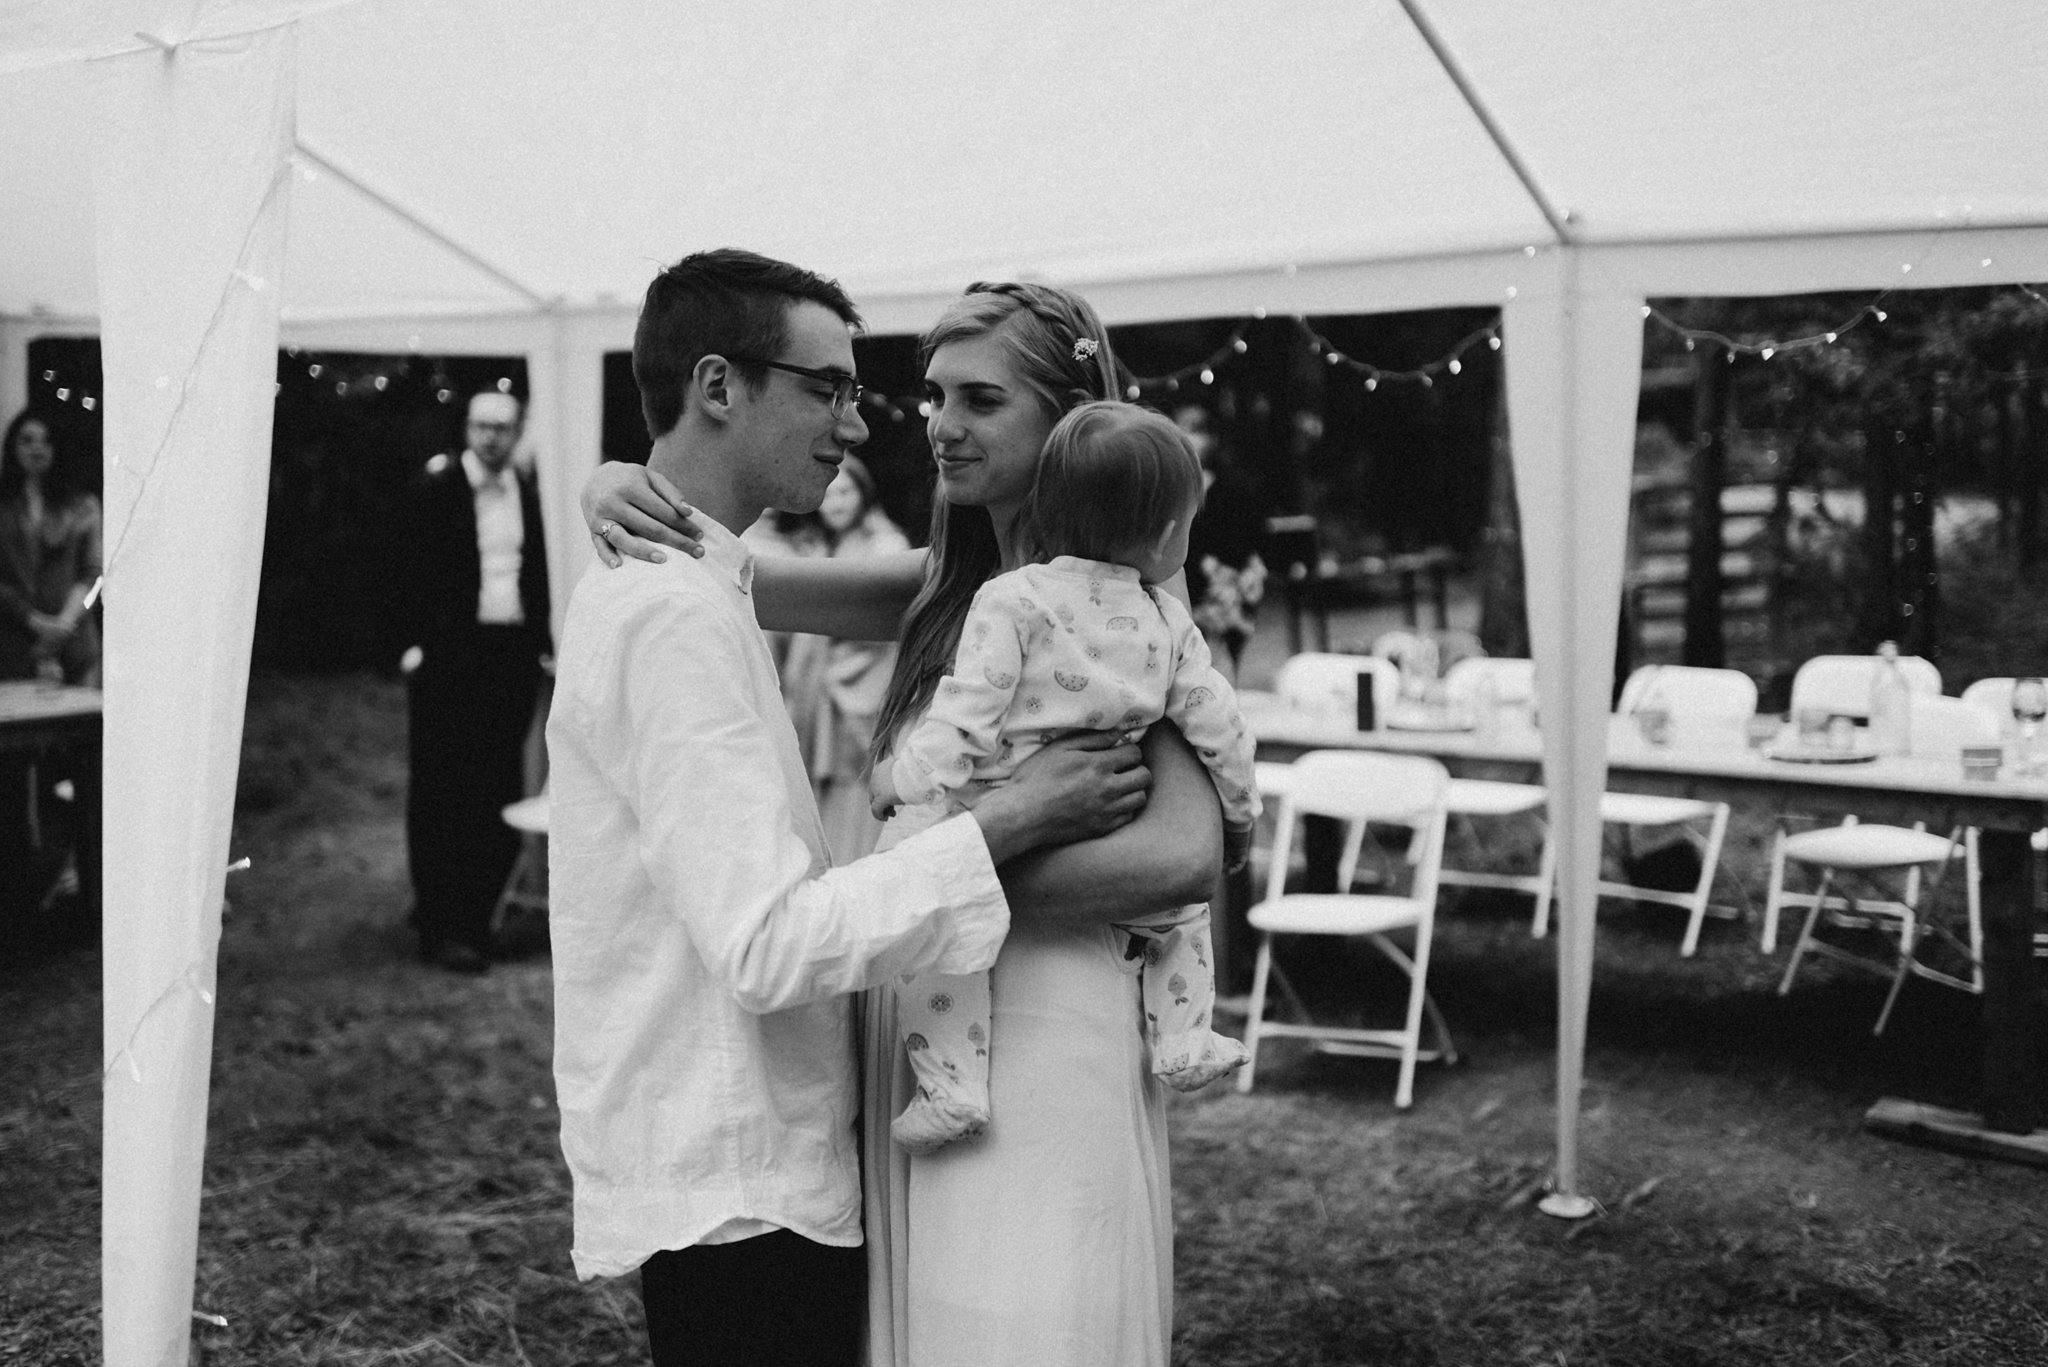 kaihla_tonai_intimate_wedding_elopement_photographer_6433.jpg